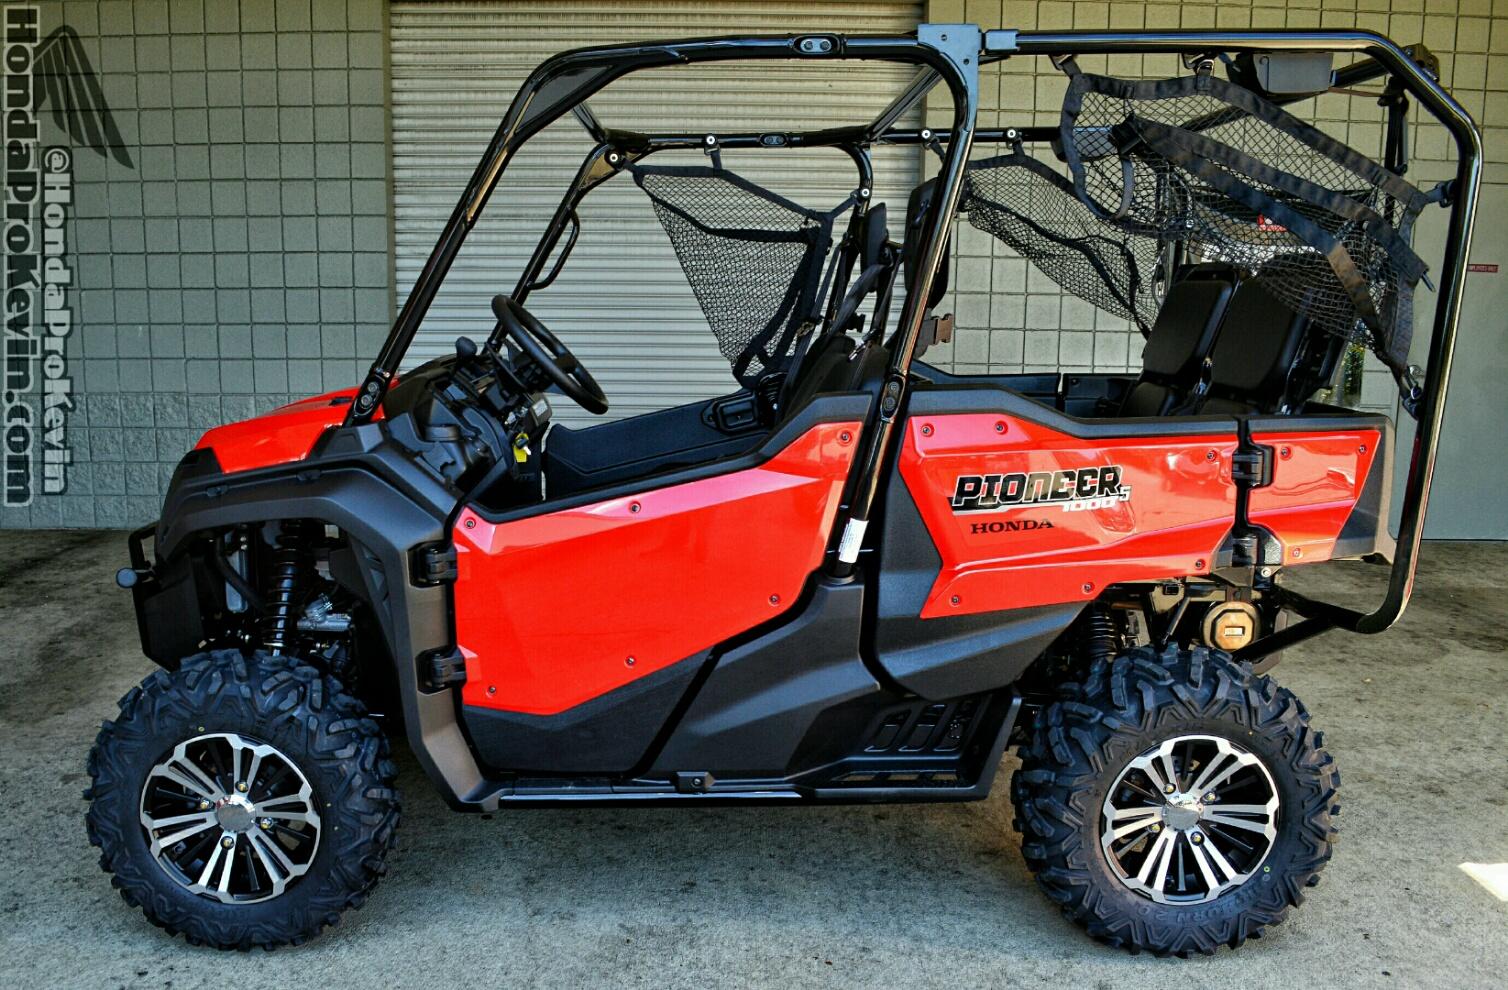 2016 Pioneer 1000 Ride Review | New Honda Side by Side 1000cc ATV / UTV / SxS